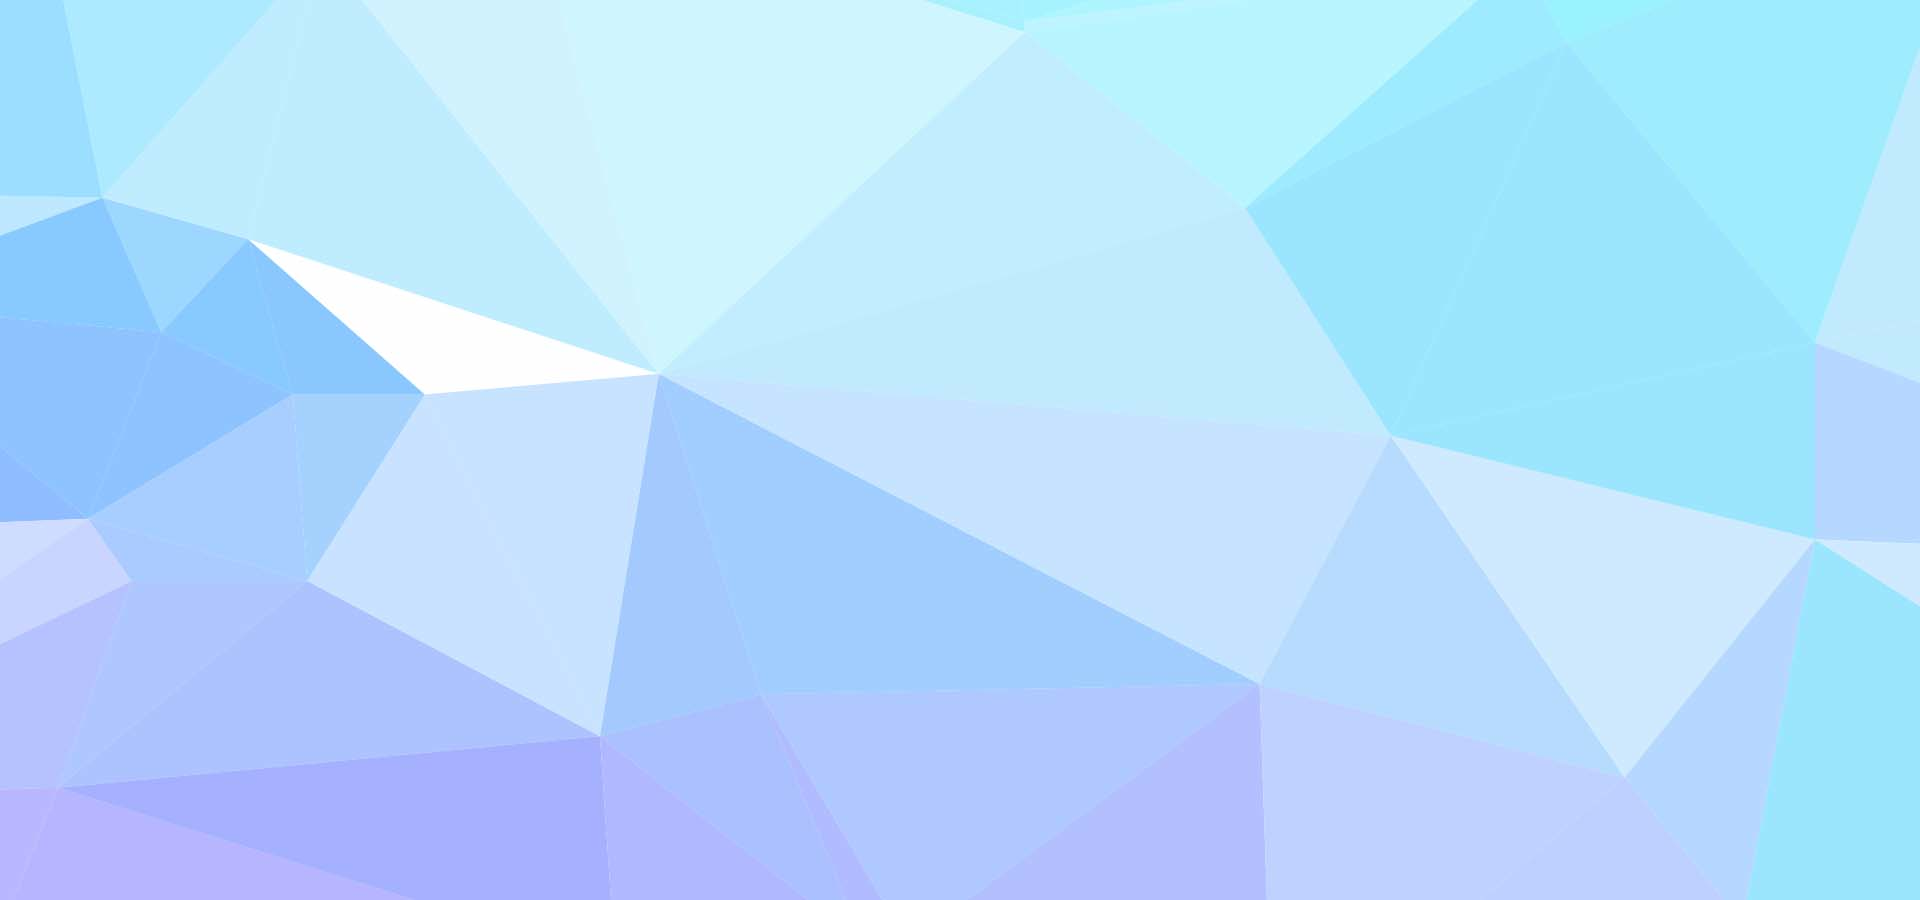 Diseño Arte Patrón Fondos De Pantalla Antecedentes: Mosaico Tile Patrón Diseño Antecedentes Fondos De